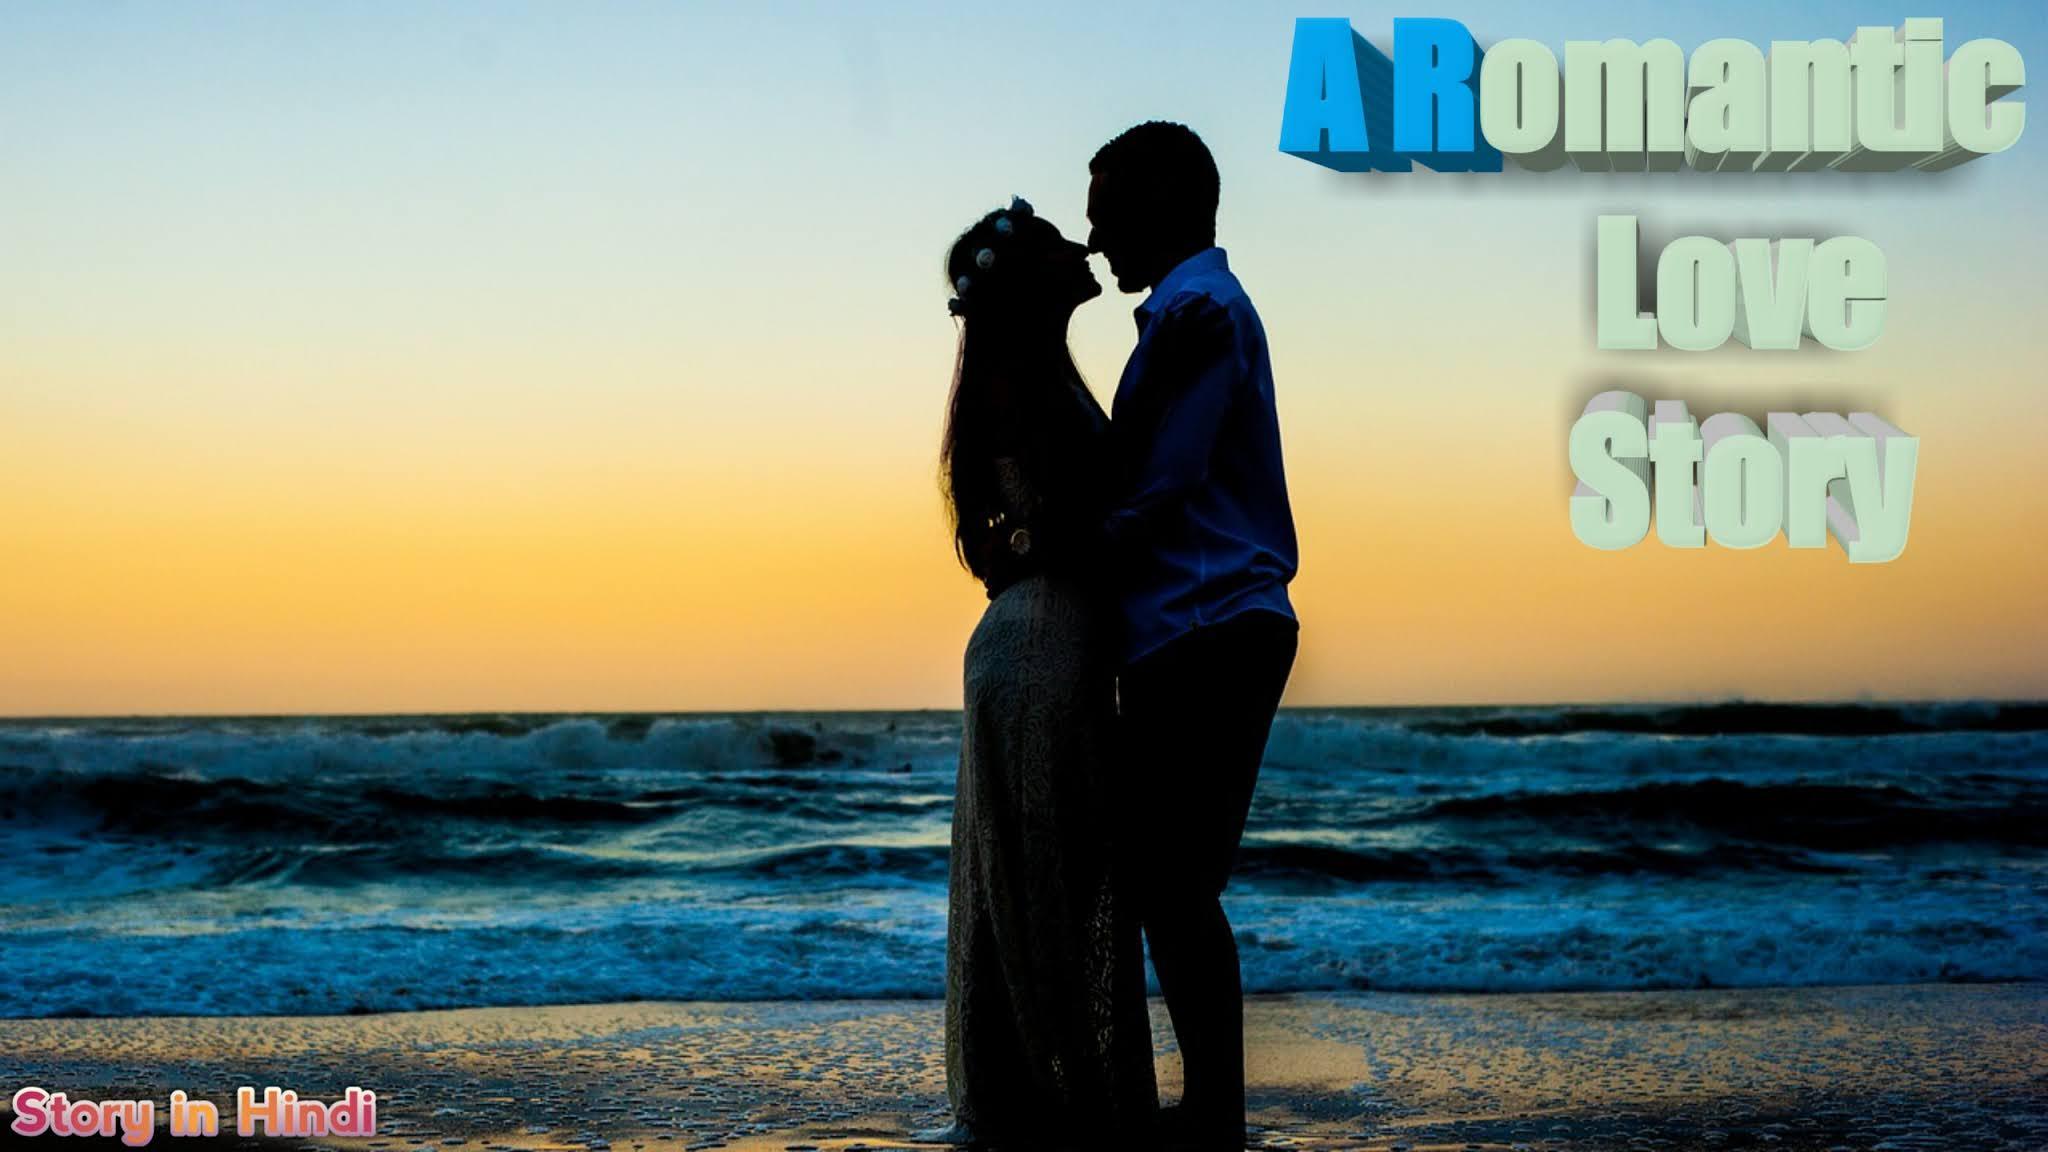 Very Romantic Love Story